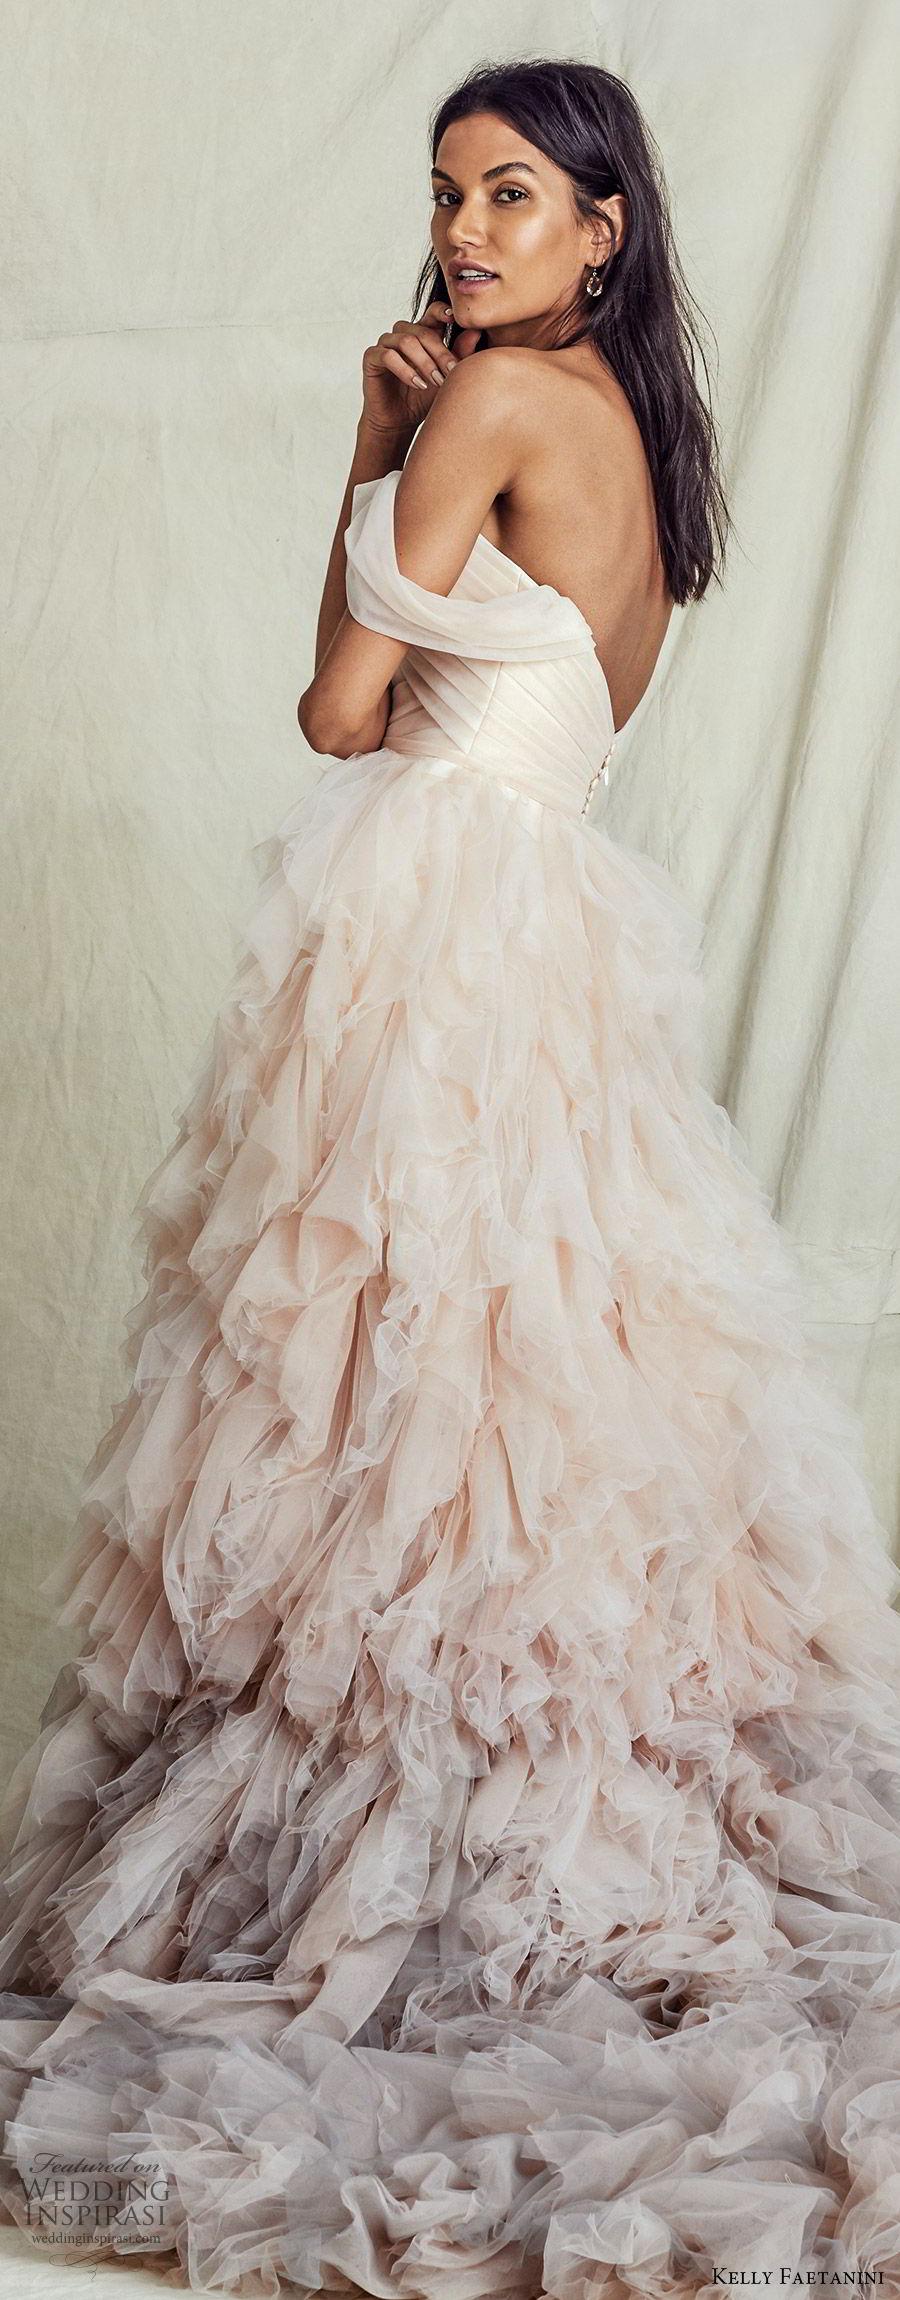 kelly faetanini fall 2019 bridal off shoulder semi sweetheart ruched bodice ball gown a line wedding dress ruffle skirt ombre blush chapel train romantic  (5) zbv